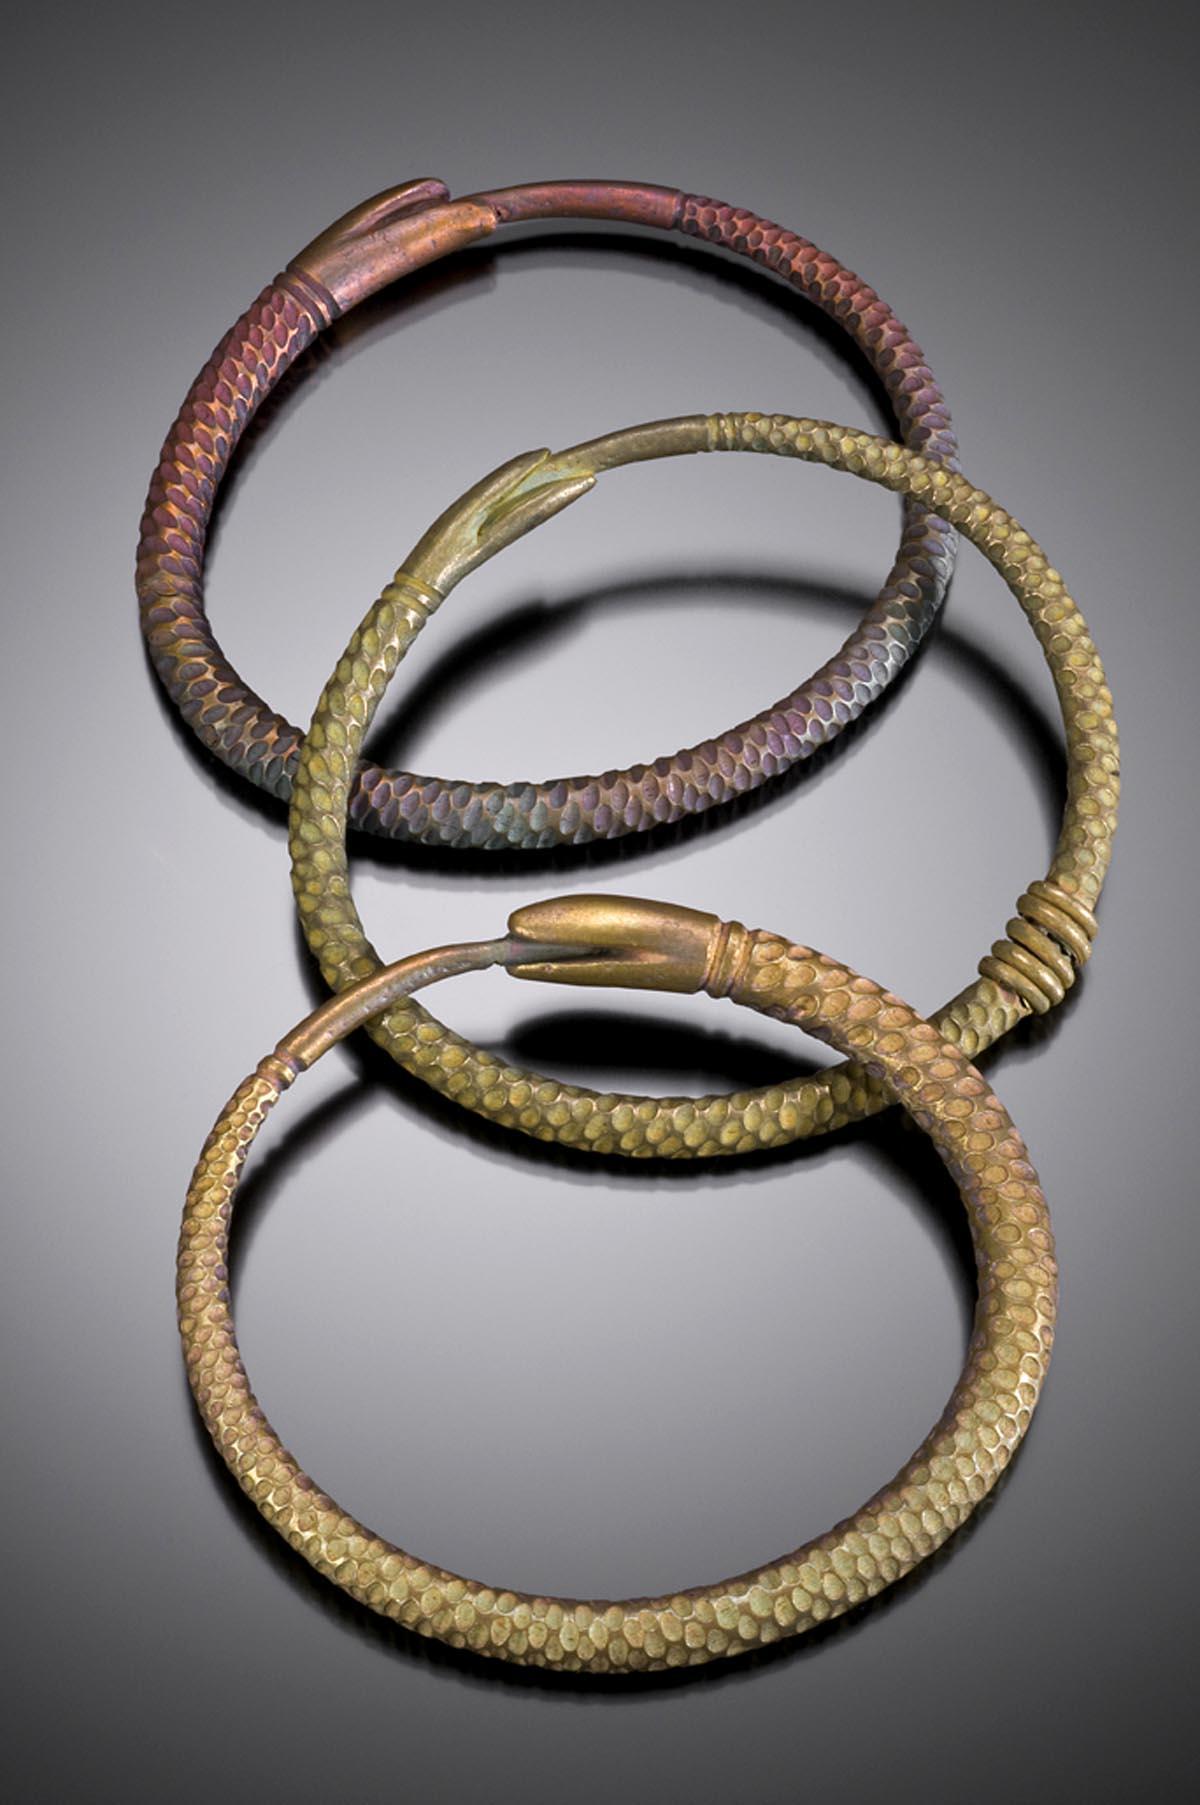 bronzebracelets.jpg